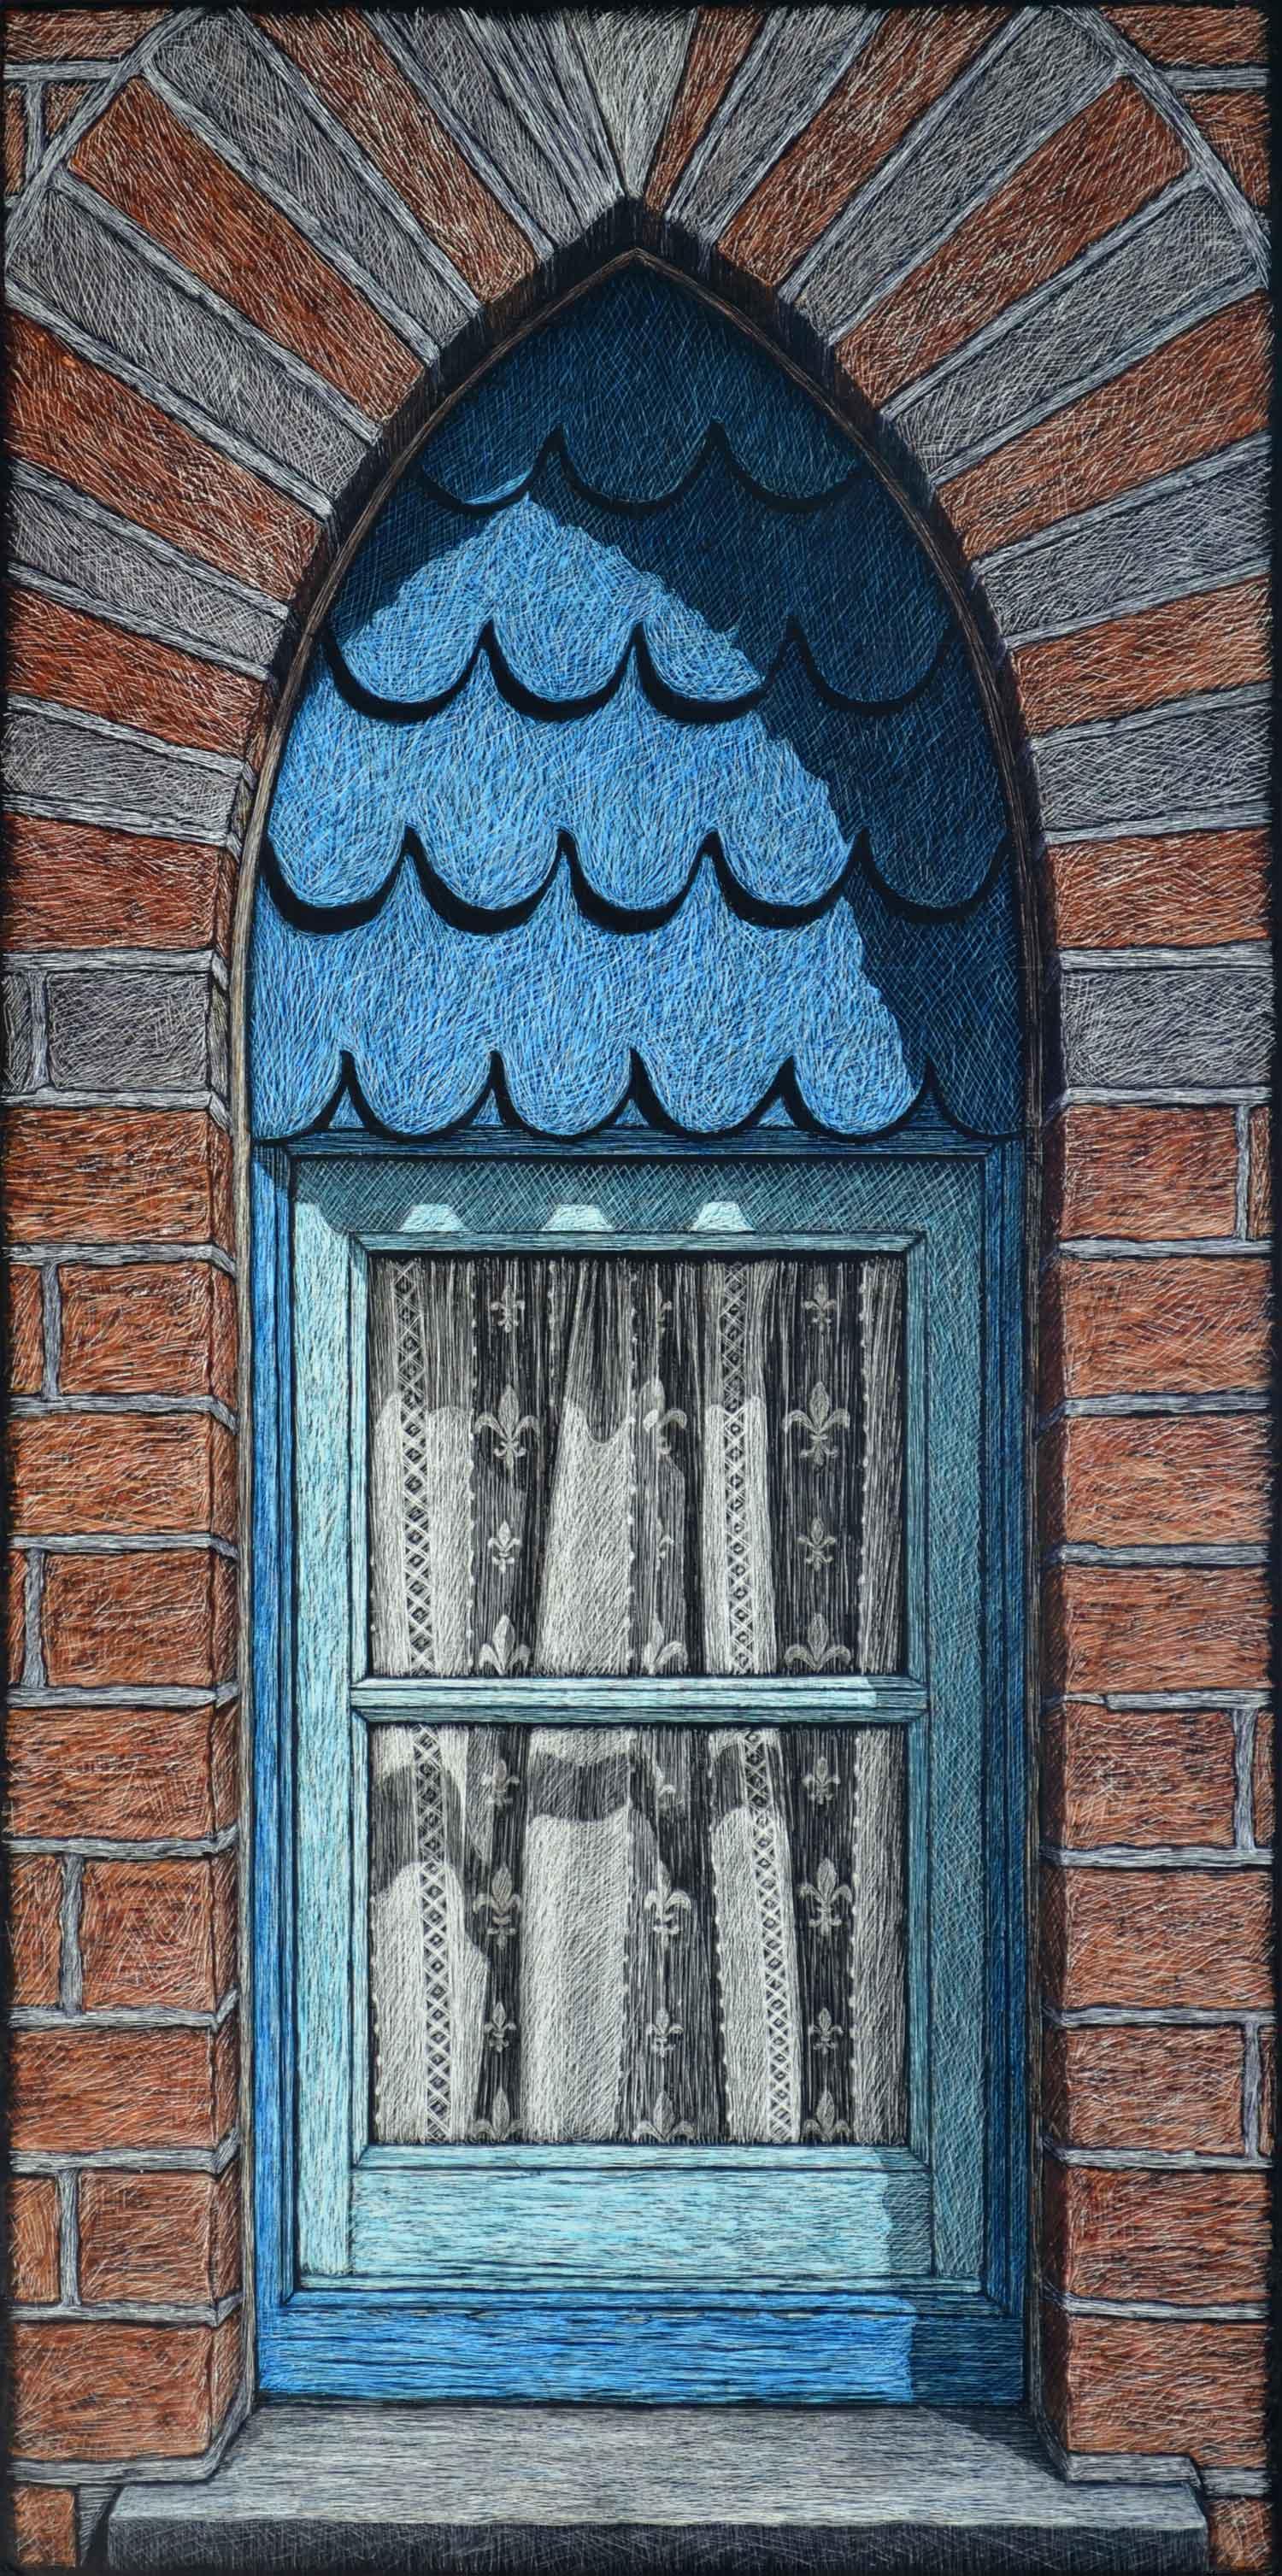 alms-house-window-rachel-newling.jpg